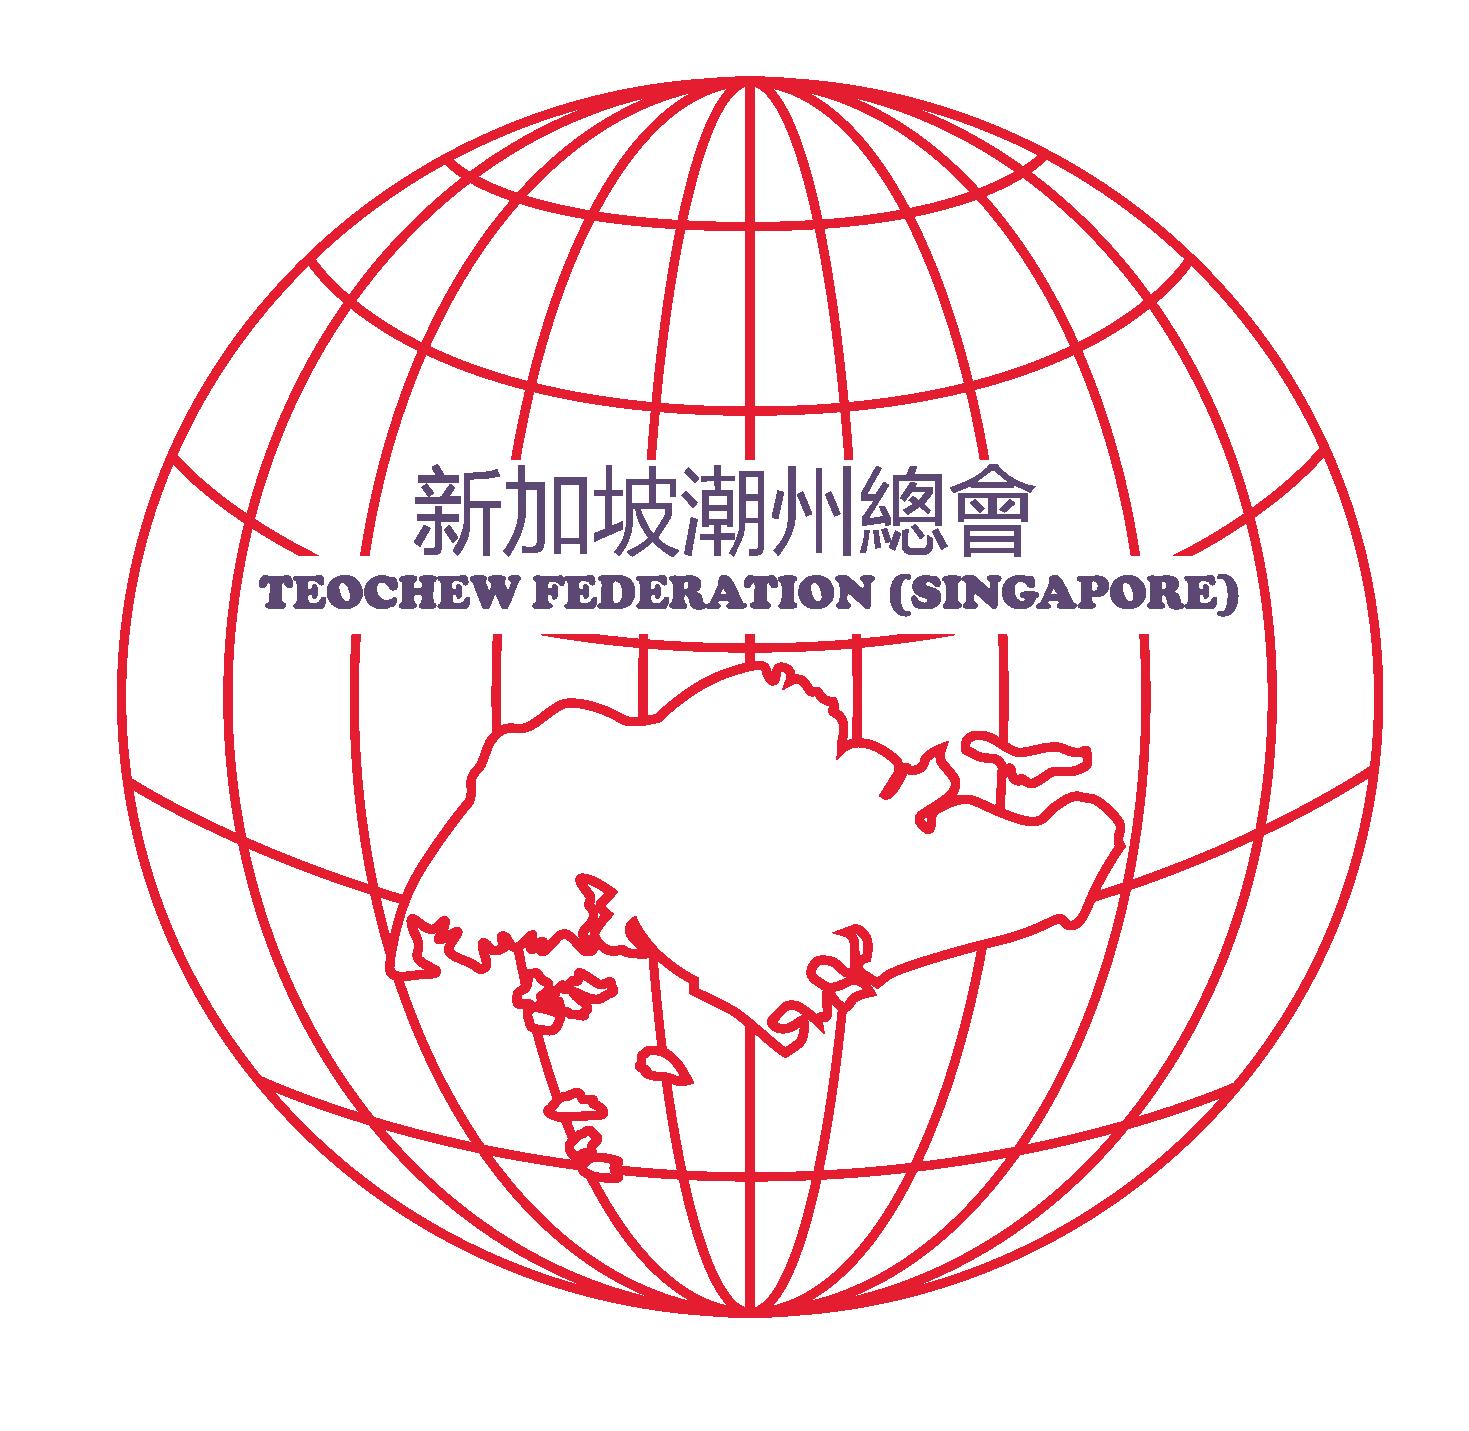 Teochewfederation